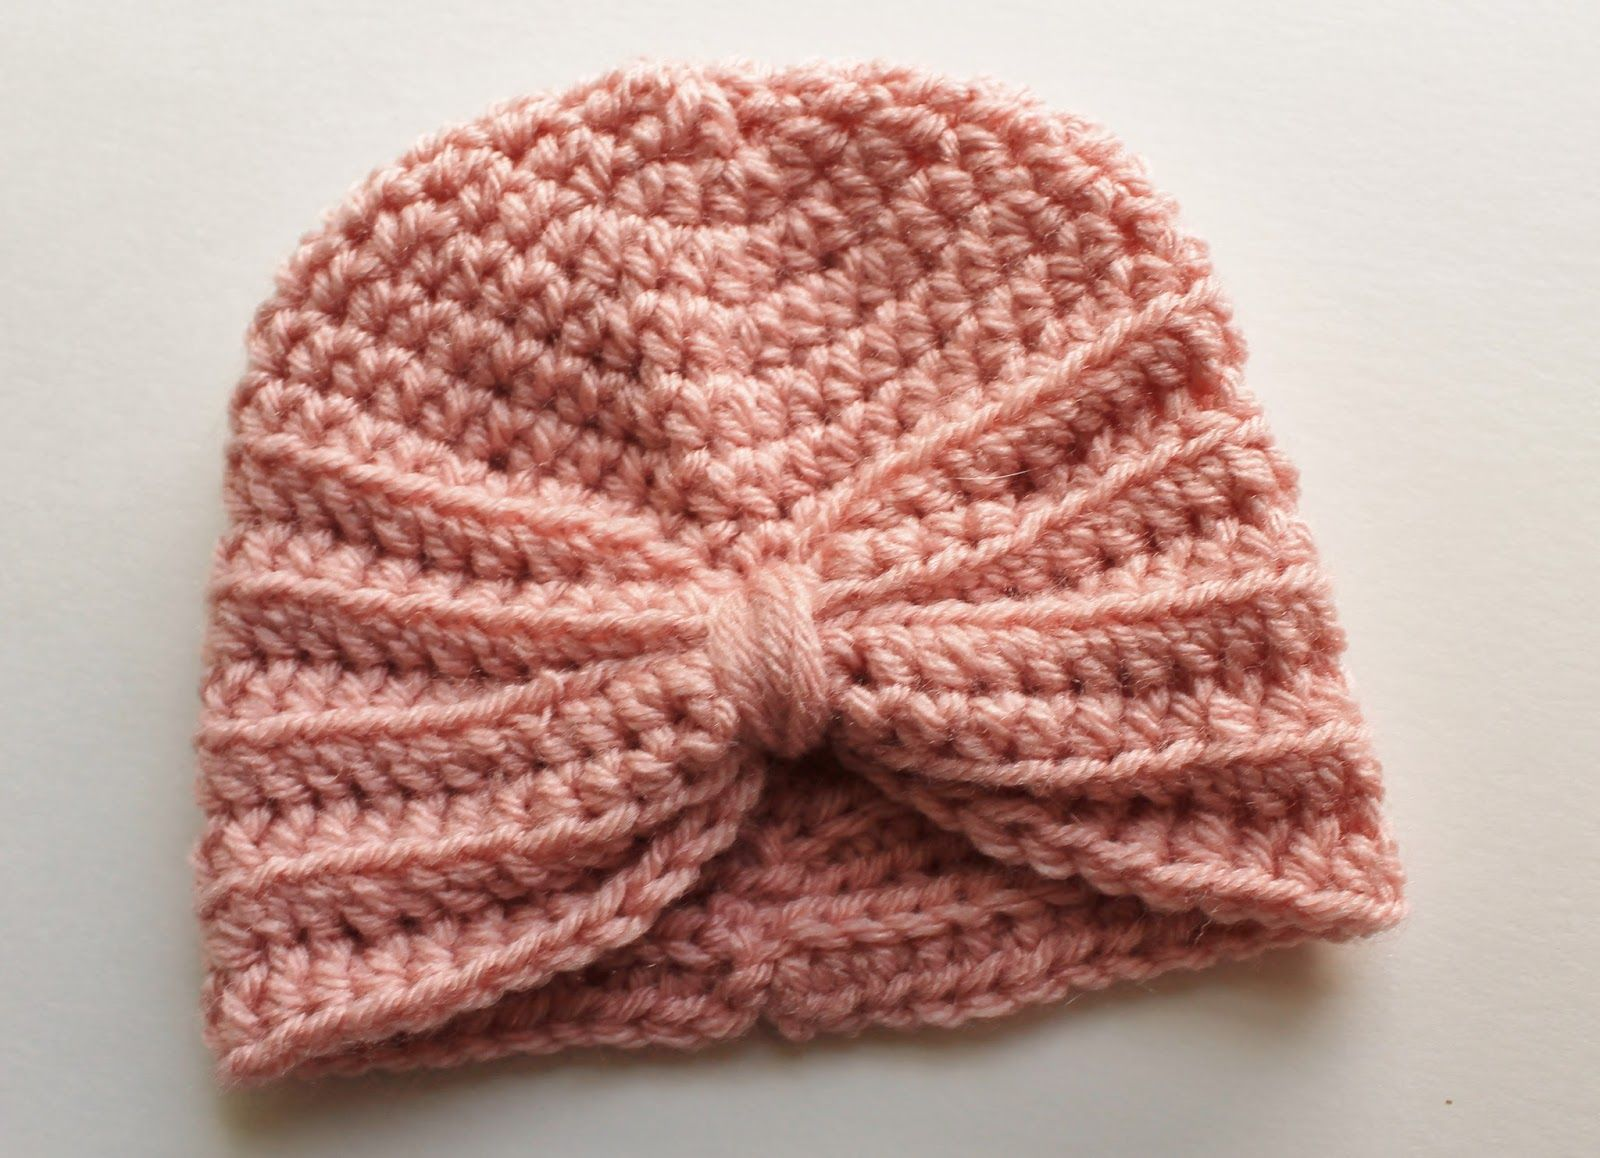 cde66c4f647 kozy   co  Crochet Baby Turban Pattern More